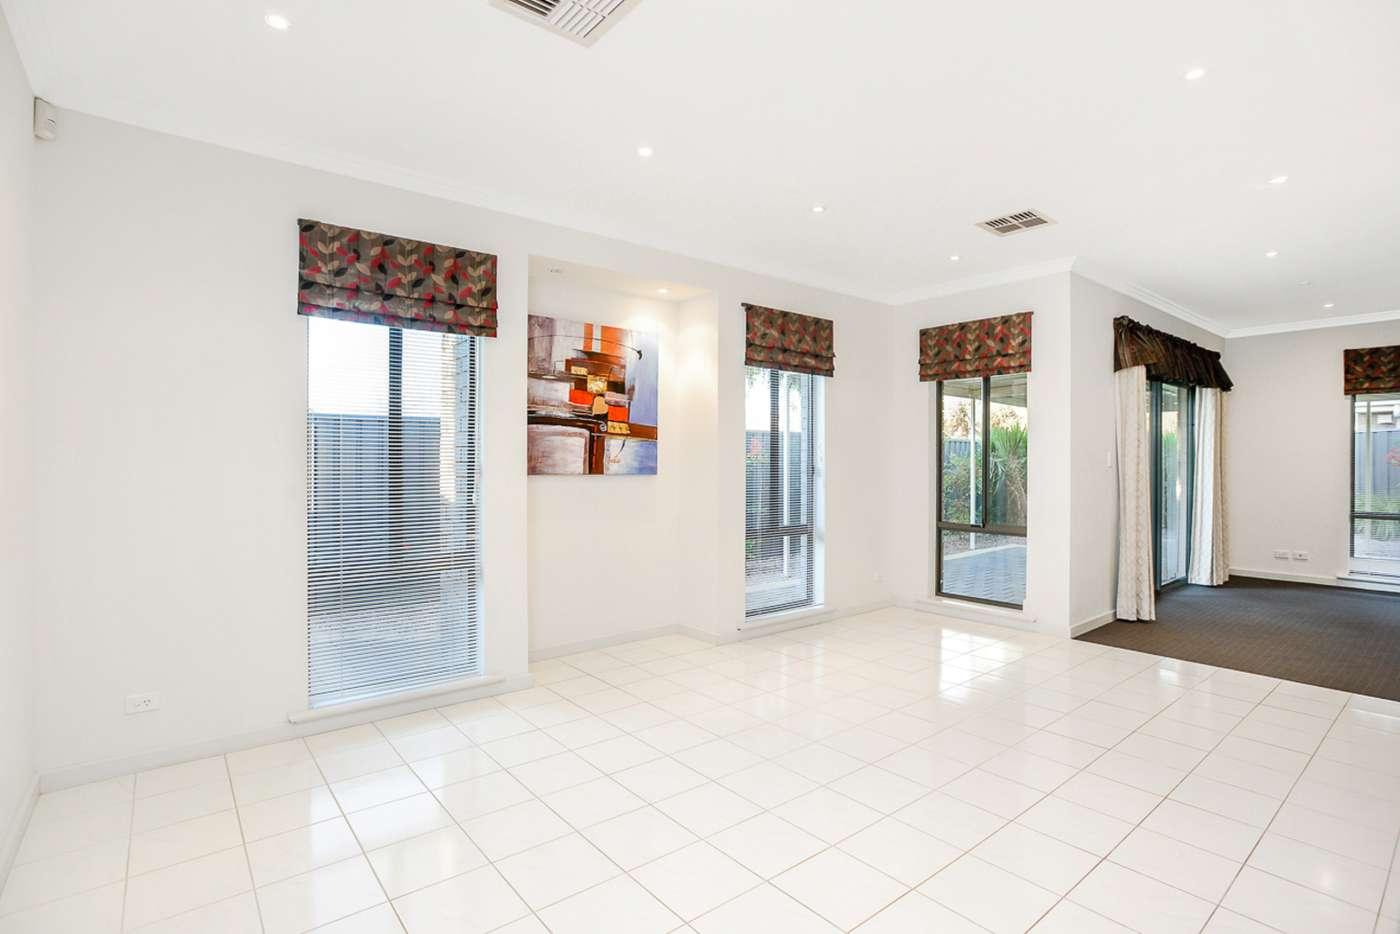 Seventh view of Homely house listing, 10 Meretta Lane, Andrews Farm SA 5114